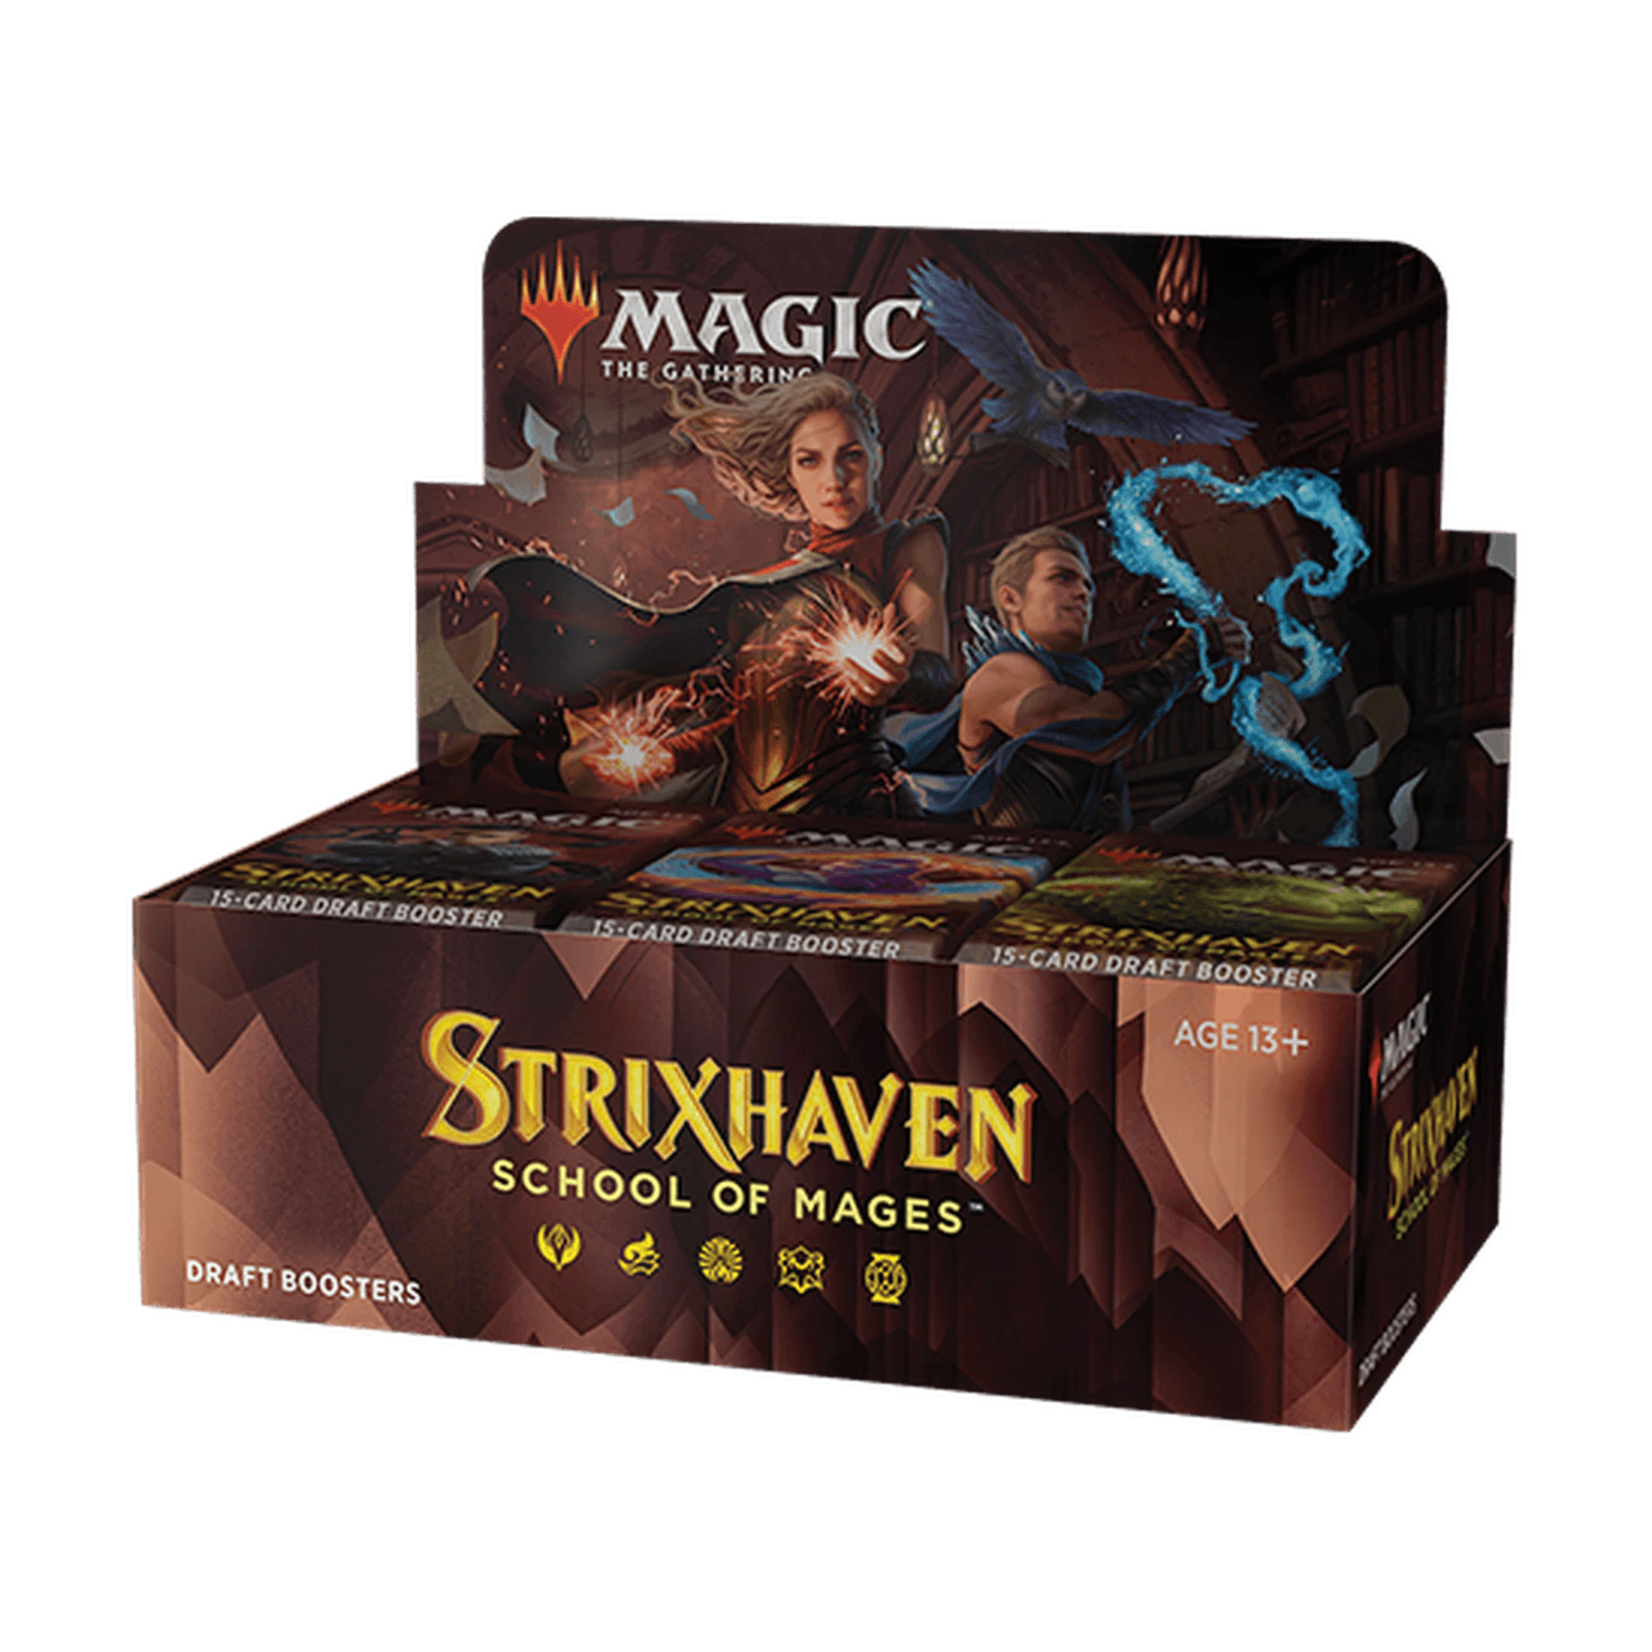 Wizards of the Coast MTG: Strixhaven Draft Bstr (Box)